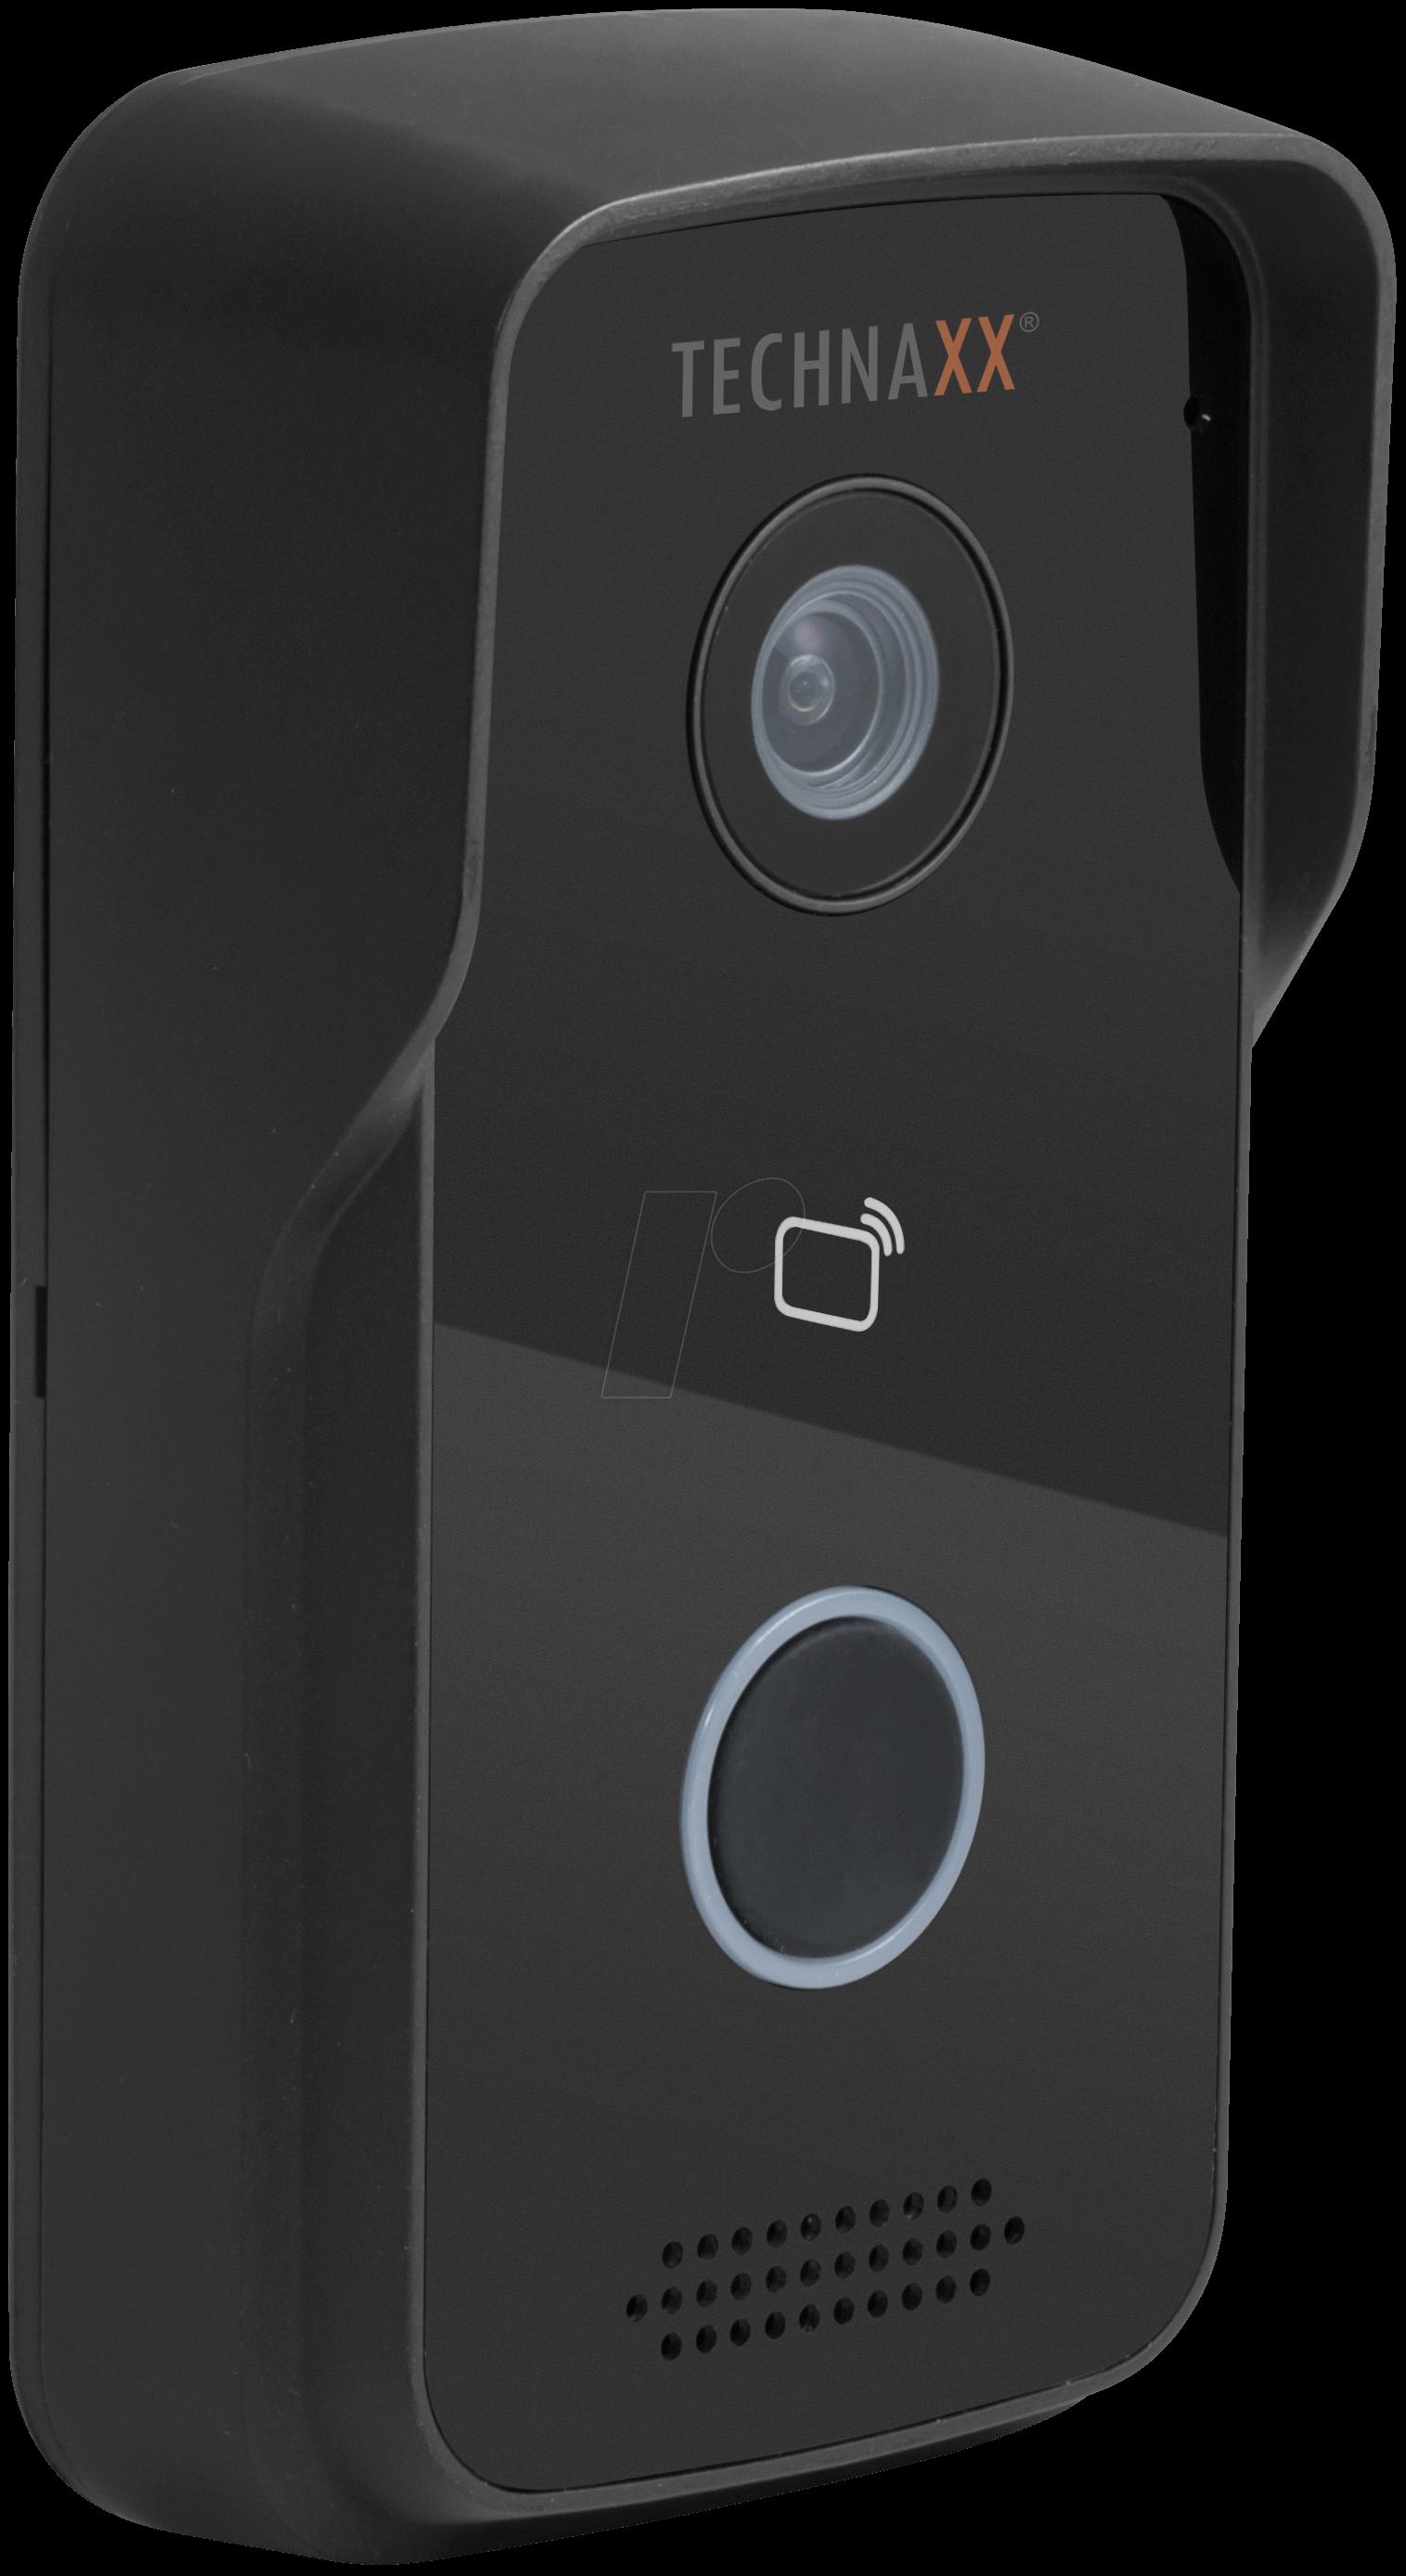 technaxx  video tuertelefon wlan bei reichelt elektronik